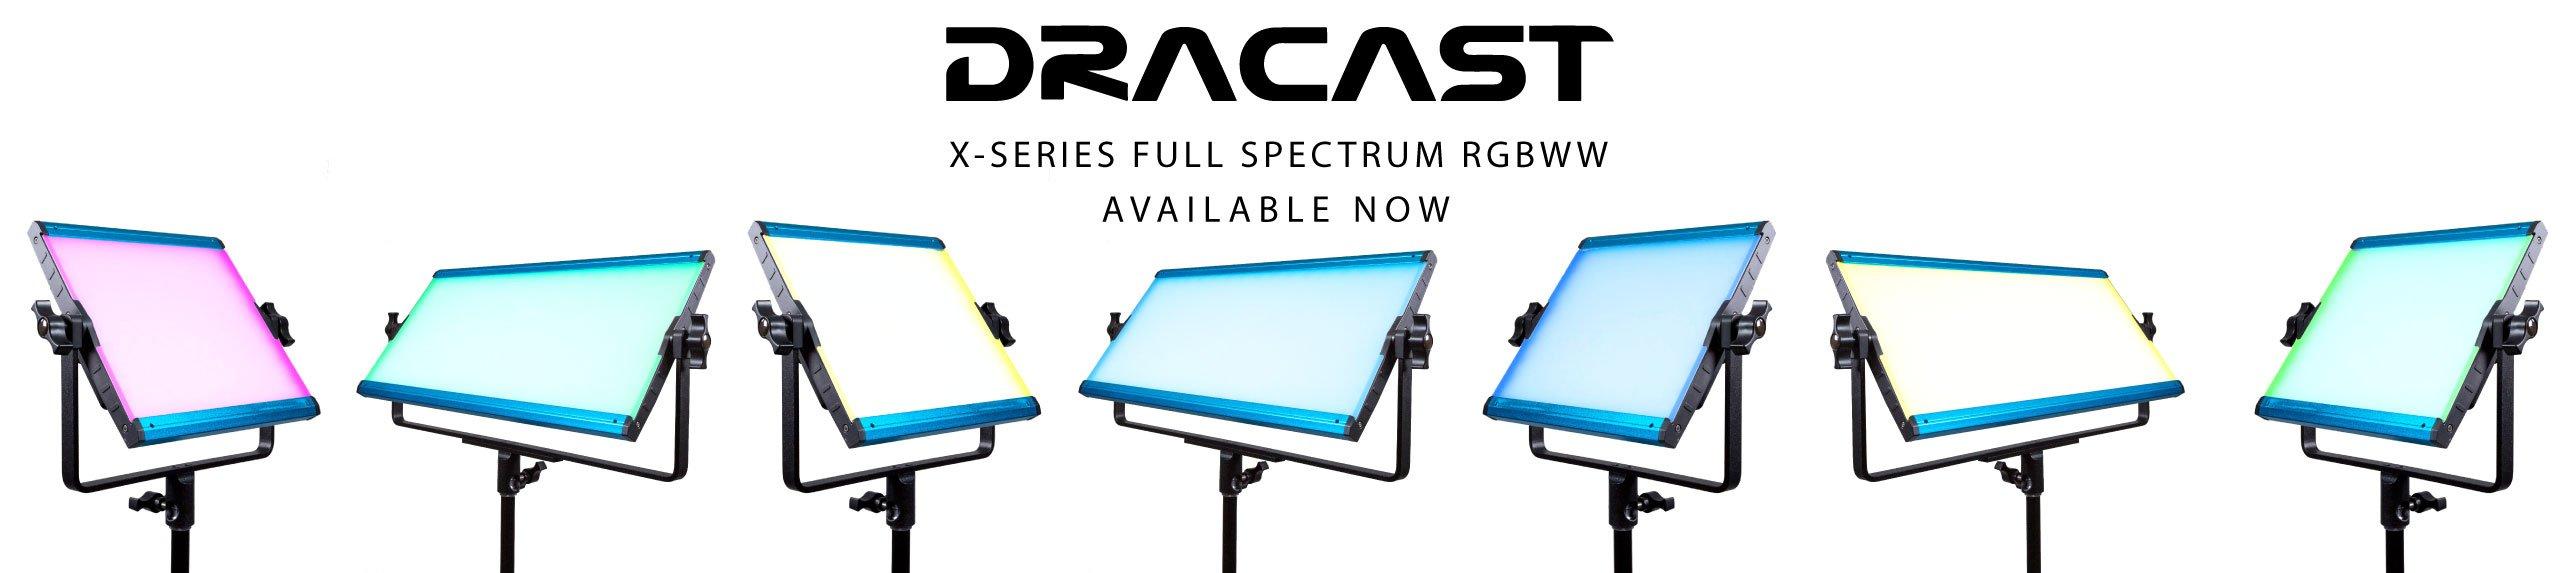 Dracast X-Series RGB LED Video Lights